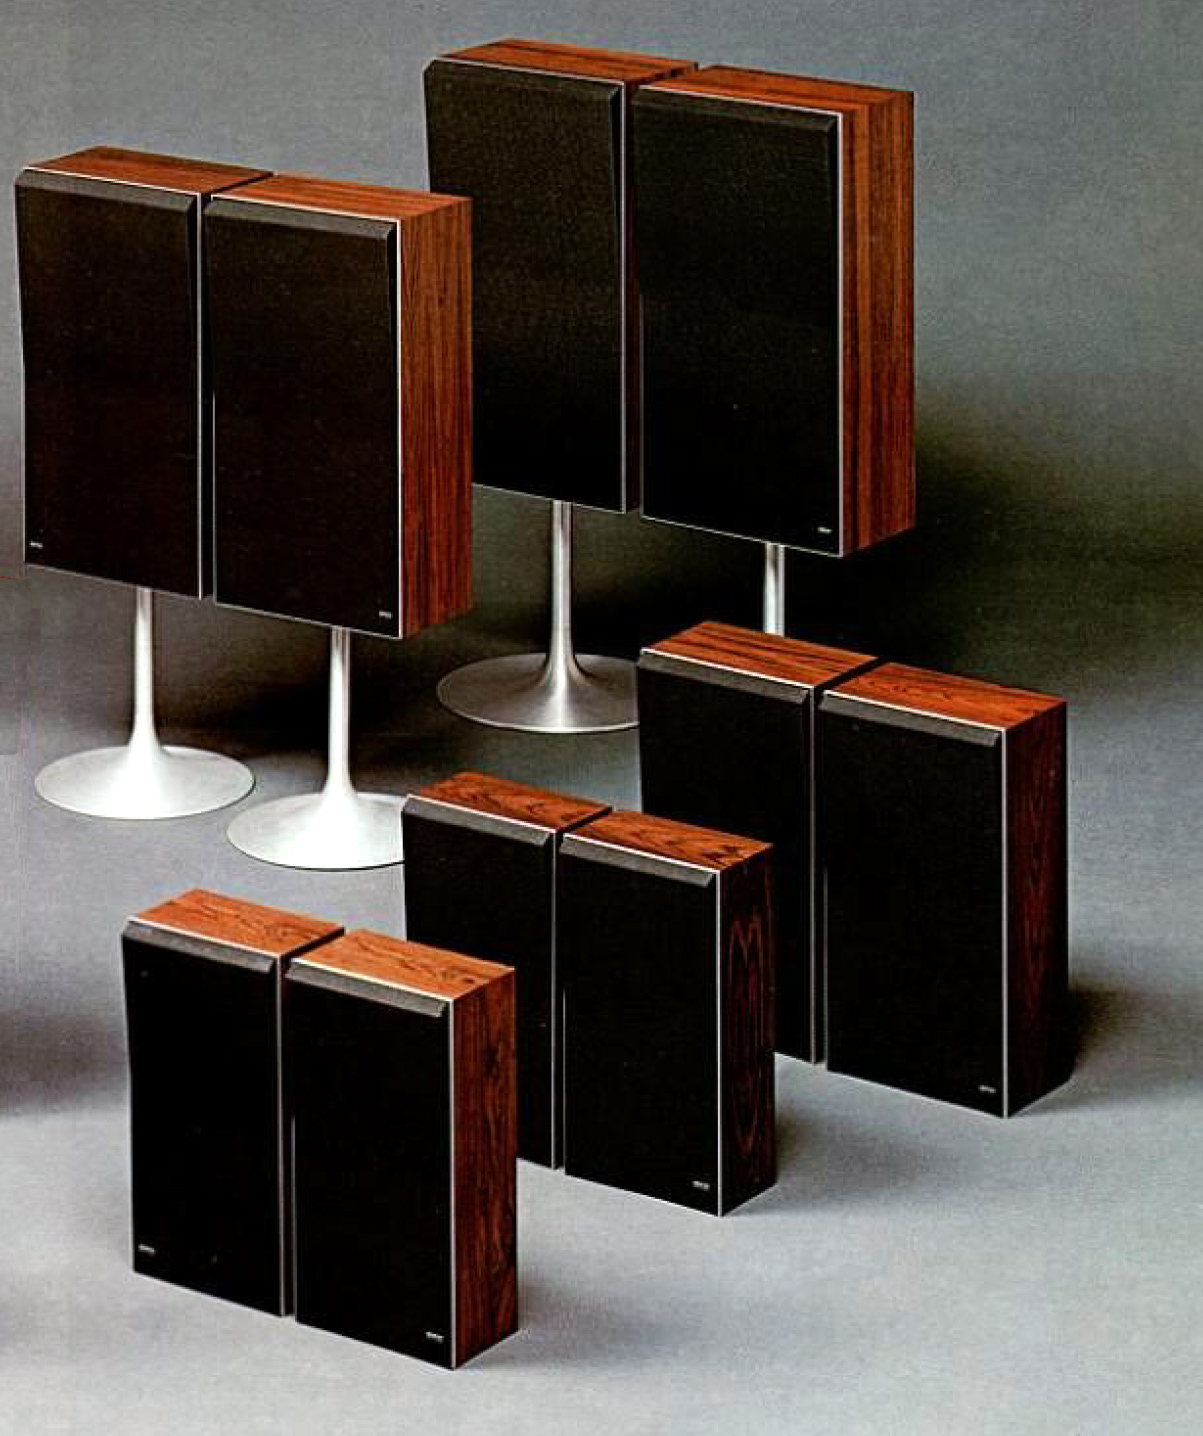 bang olufsen beovox s 30 hifi. Black Bedroom Furniture Sets. Home Design Ideas